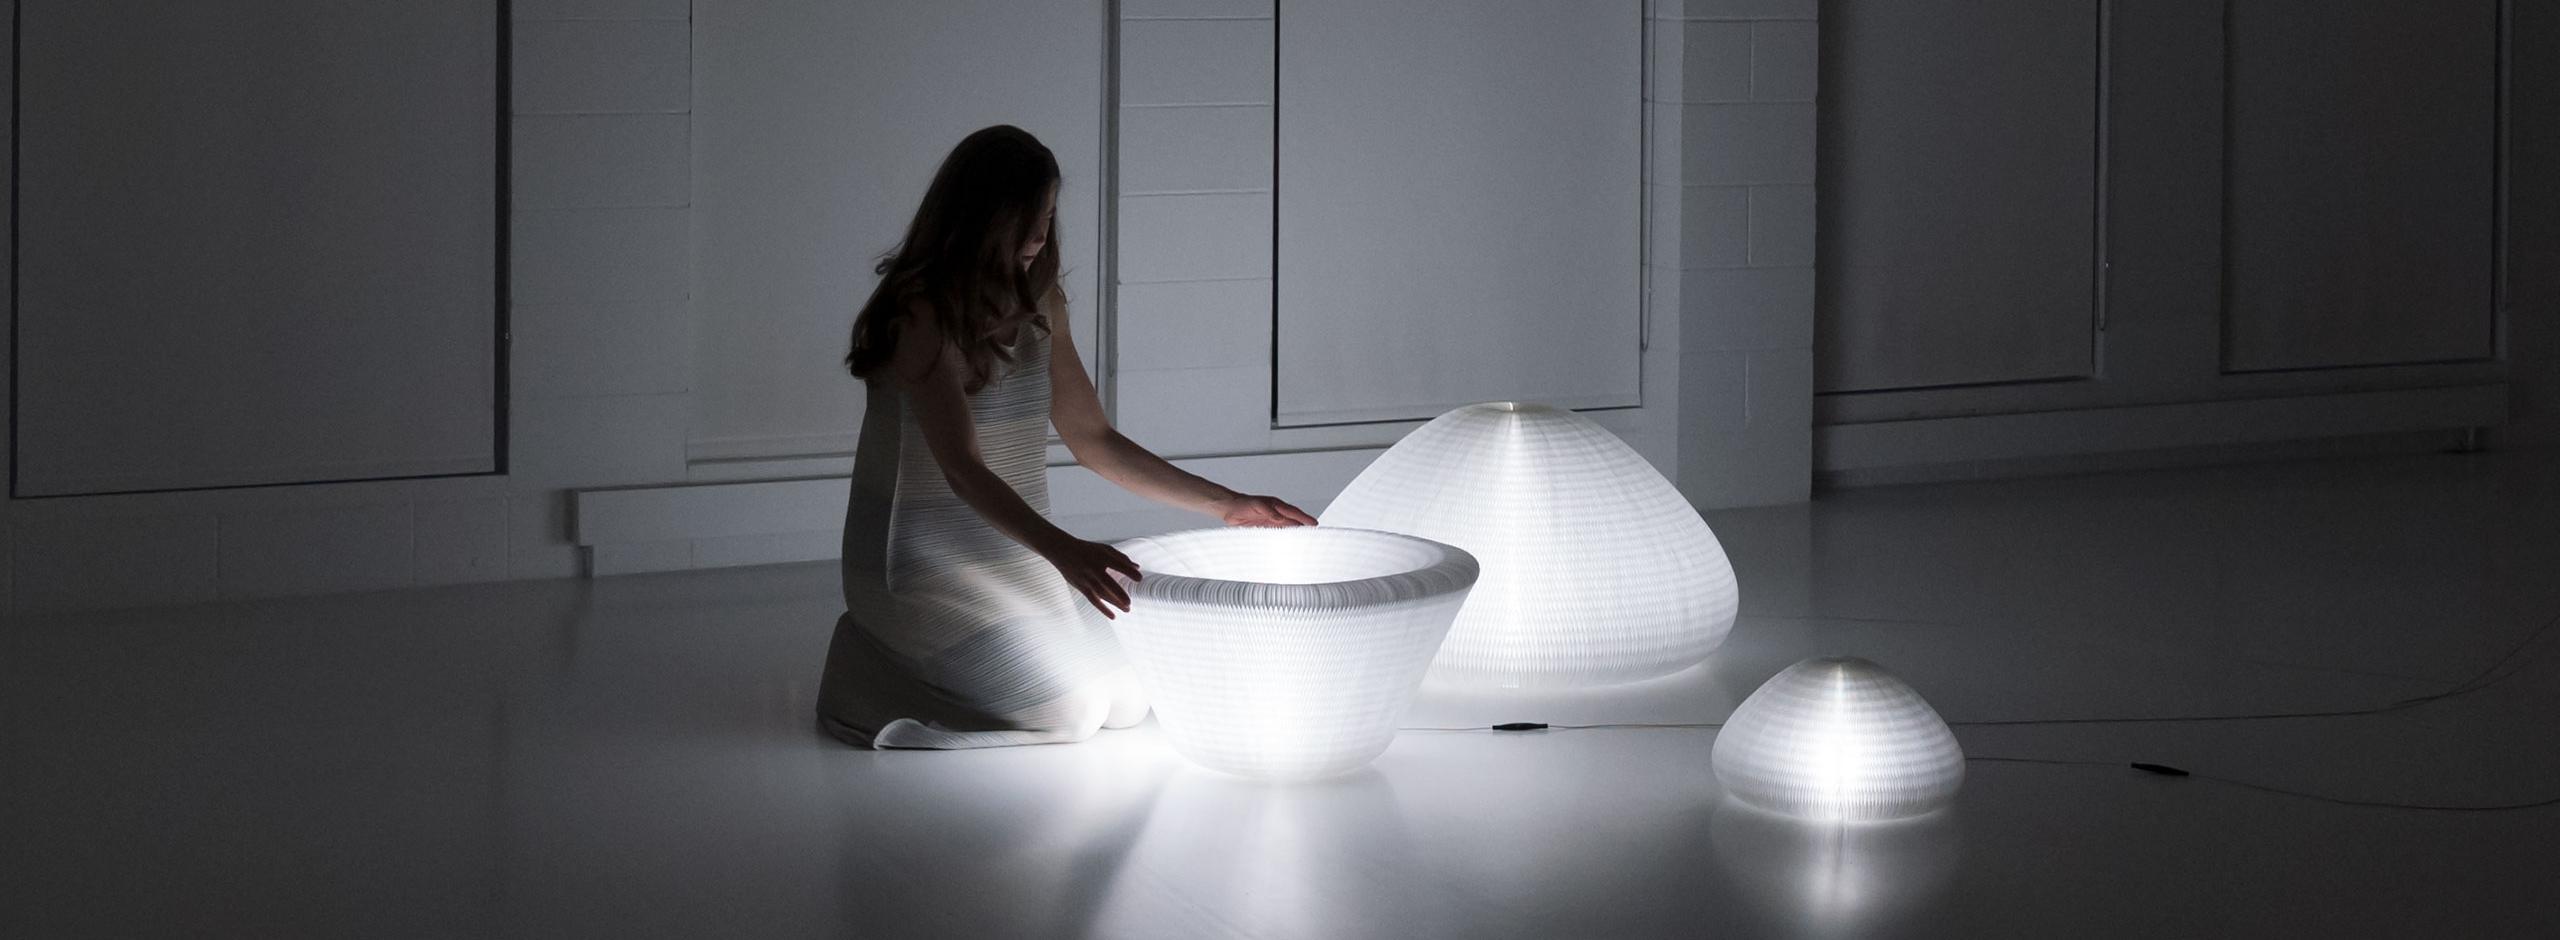 urchin softlight - Shape Shifting Lamp Lights - Paper Lighting